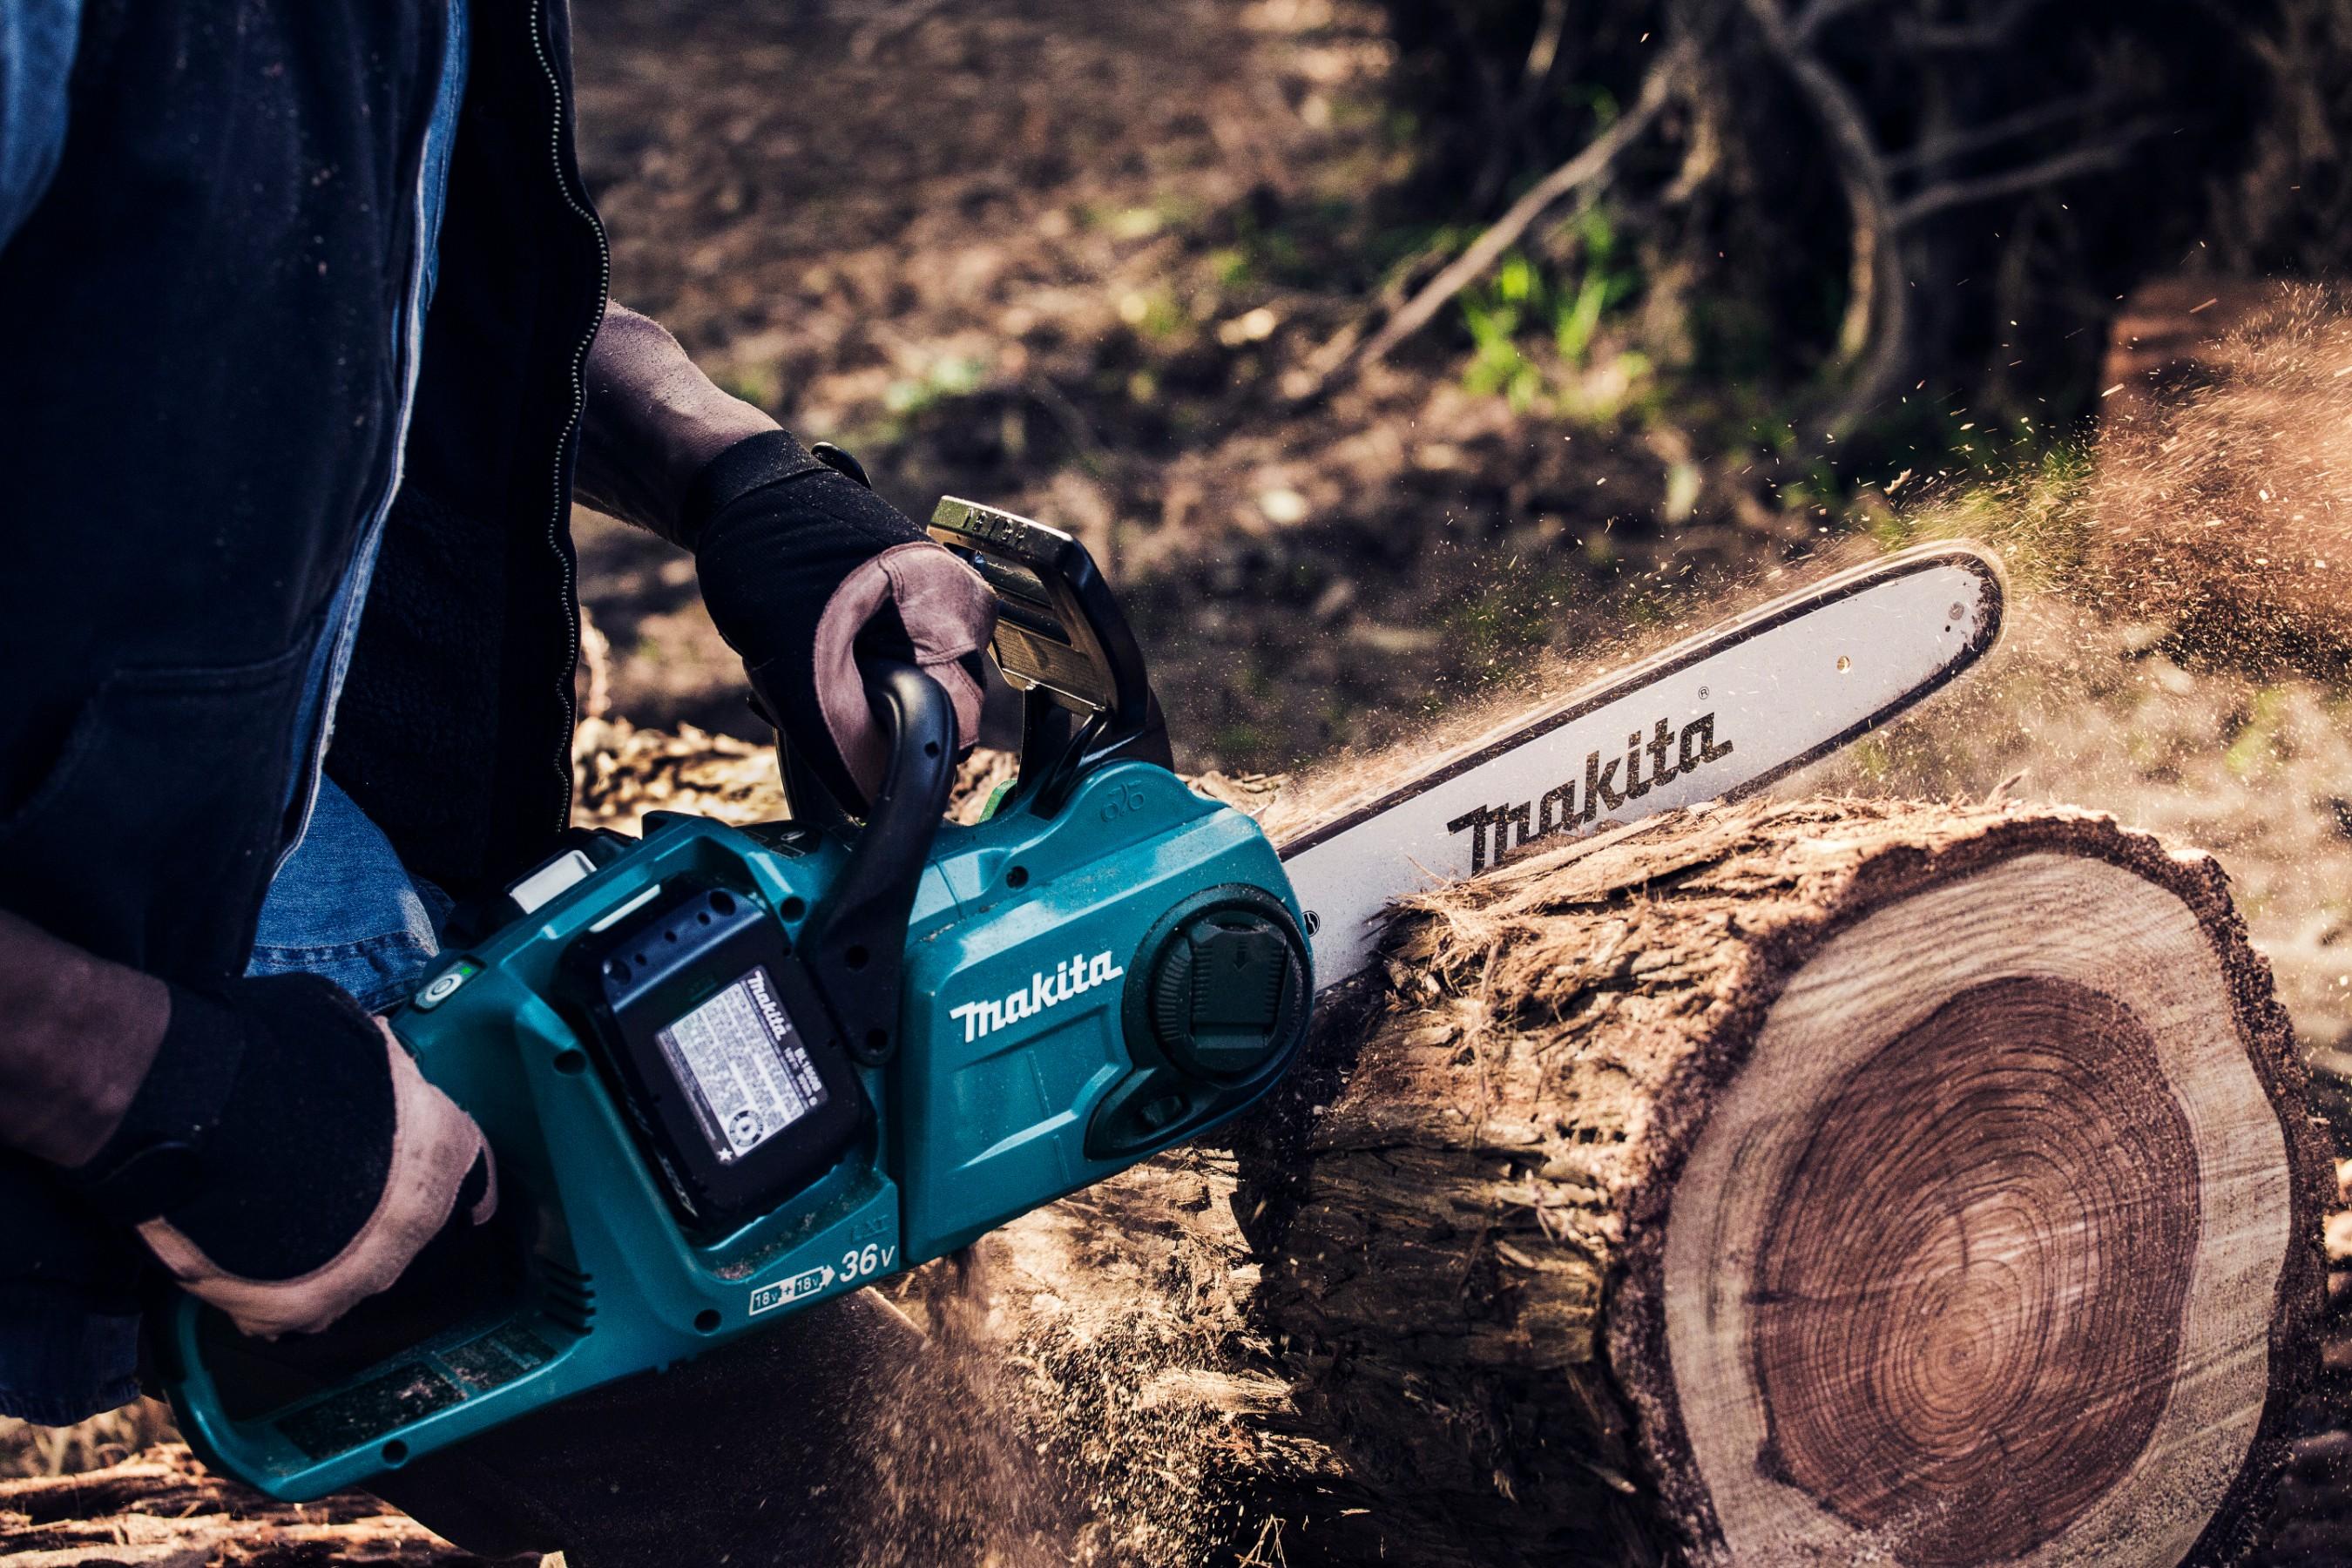 Makita LXT Cordless Chain Saw